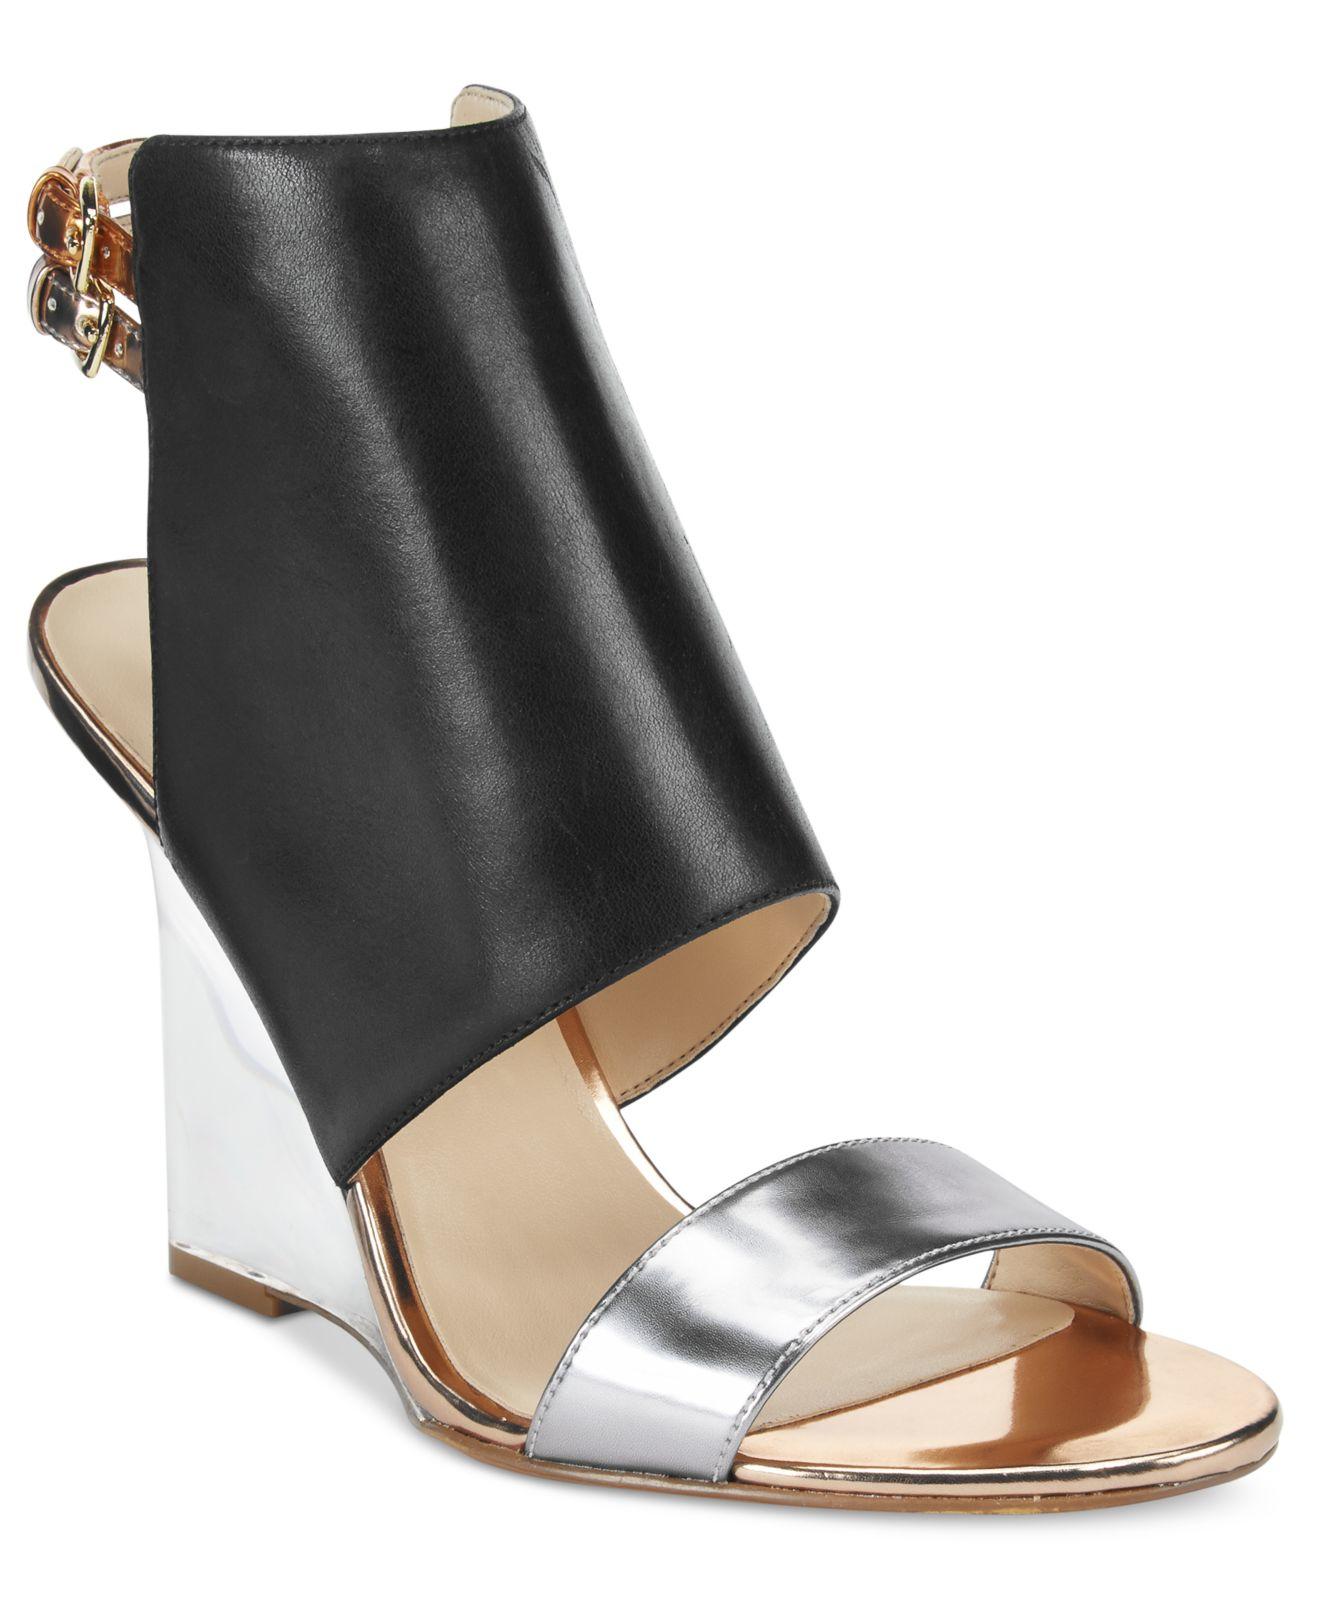 63f9e7a42814c7 Lyst - Nine West Bueta Wedge Sandals in Black